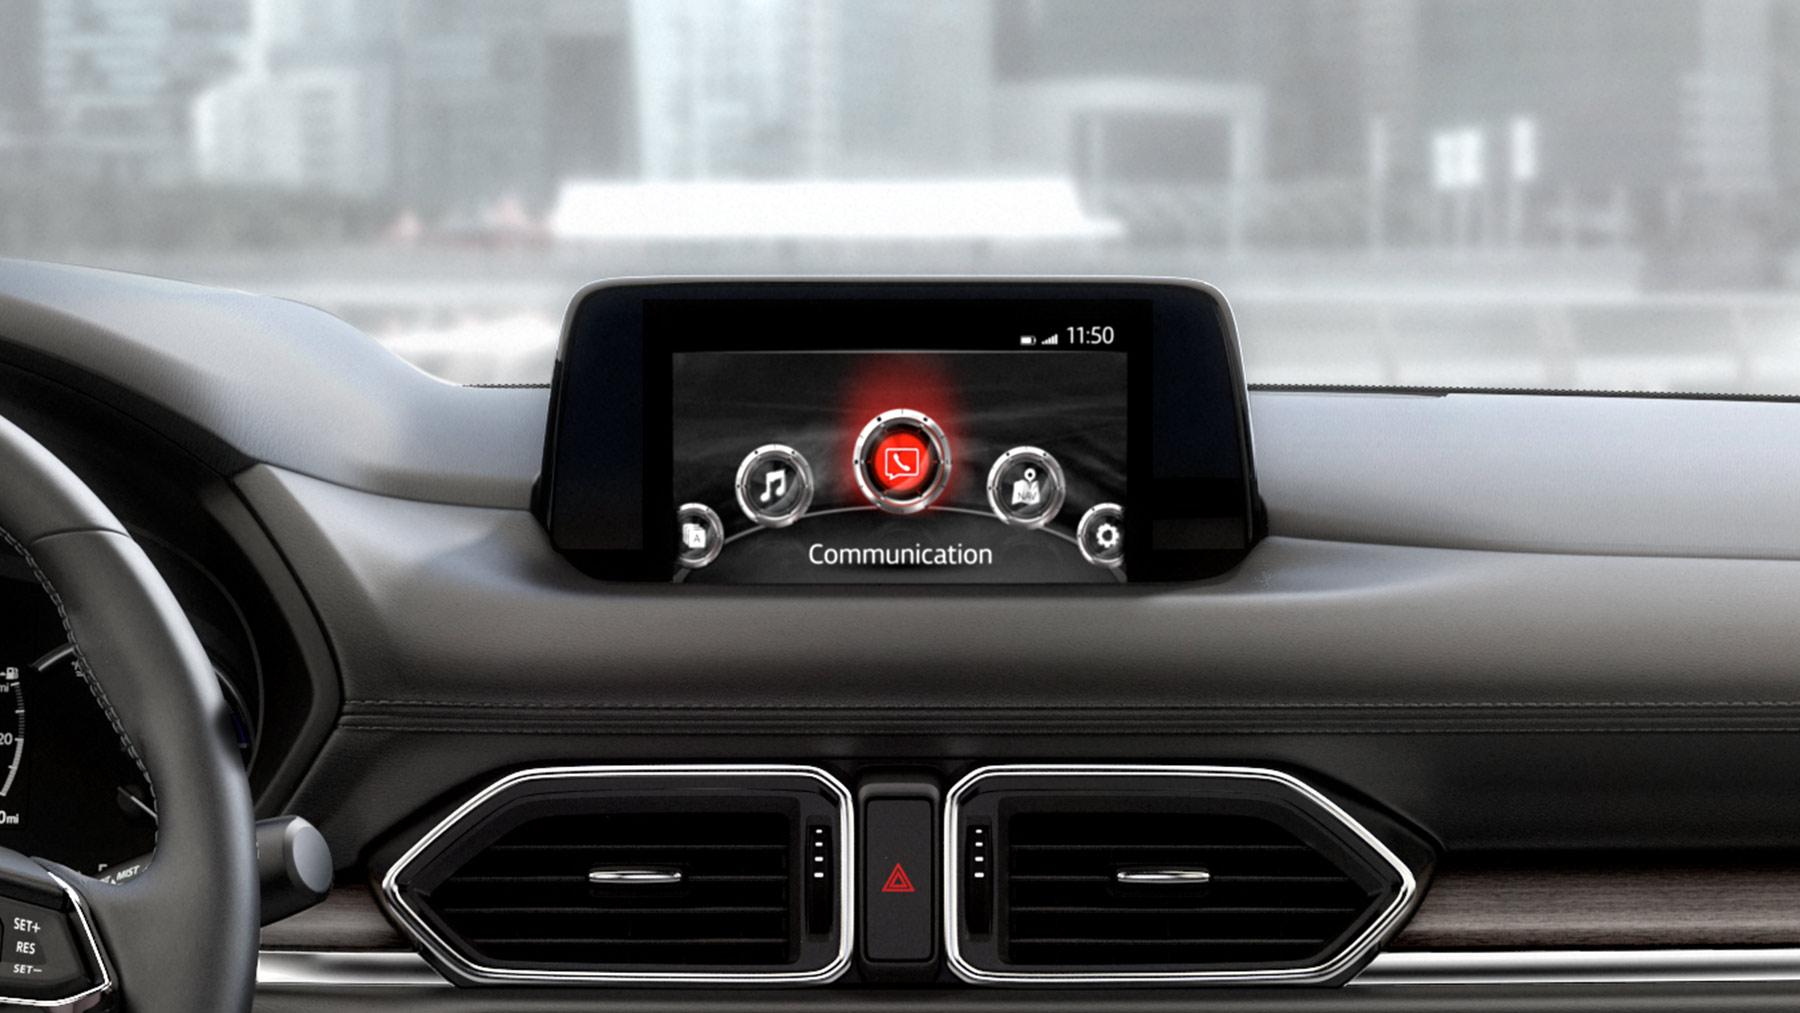 2019 Mazda CX-5 Infotainment System